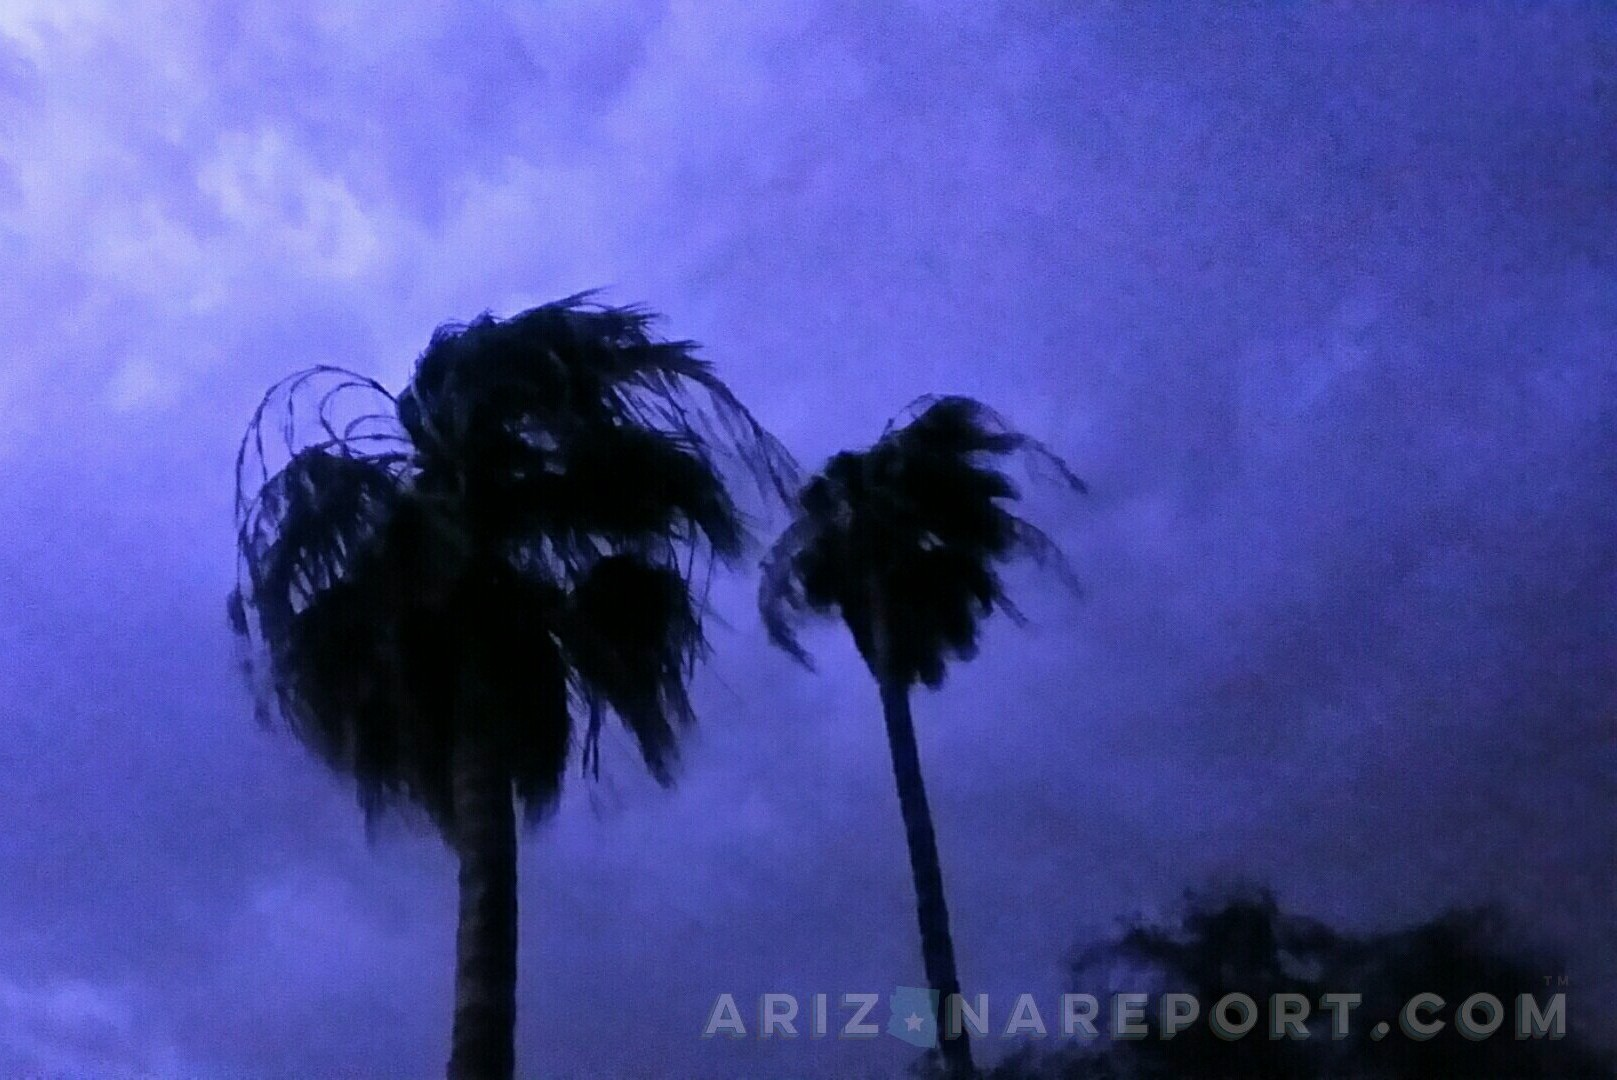 Phoenix Housing Market Horizon Has Too Many Storm Clouds